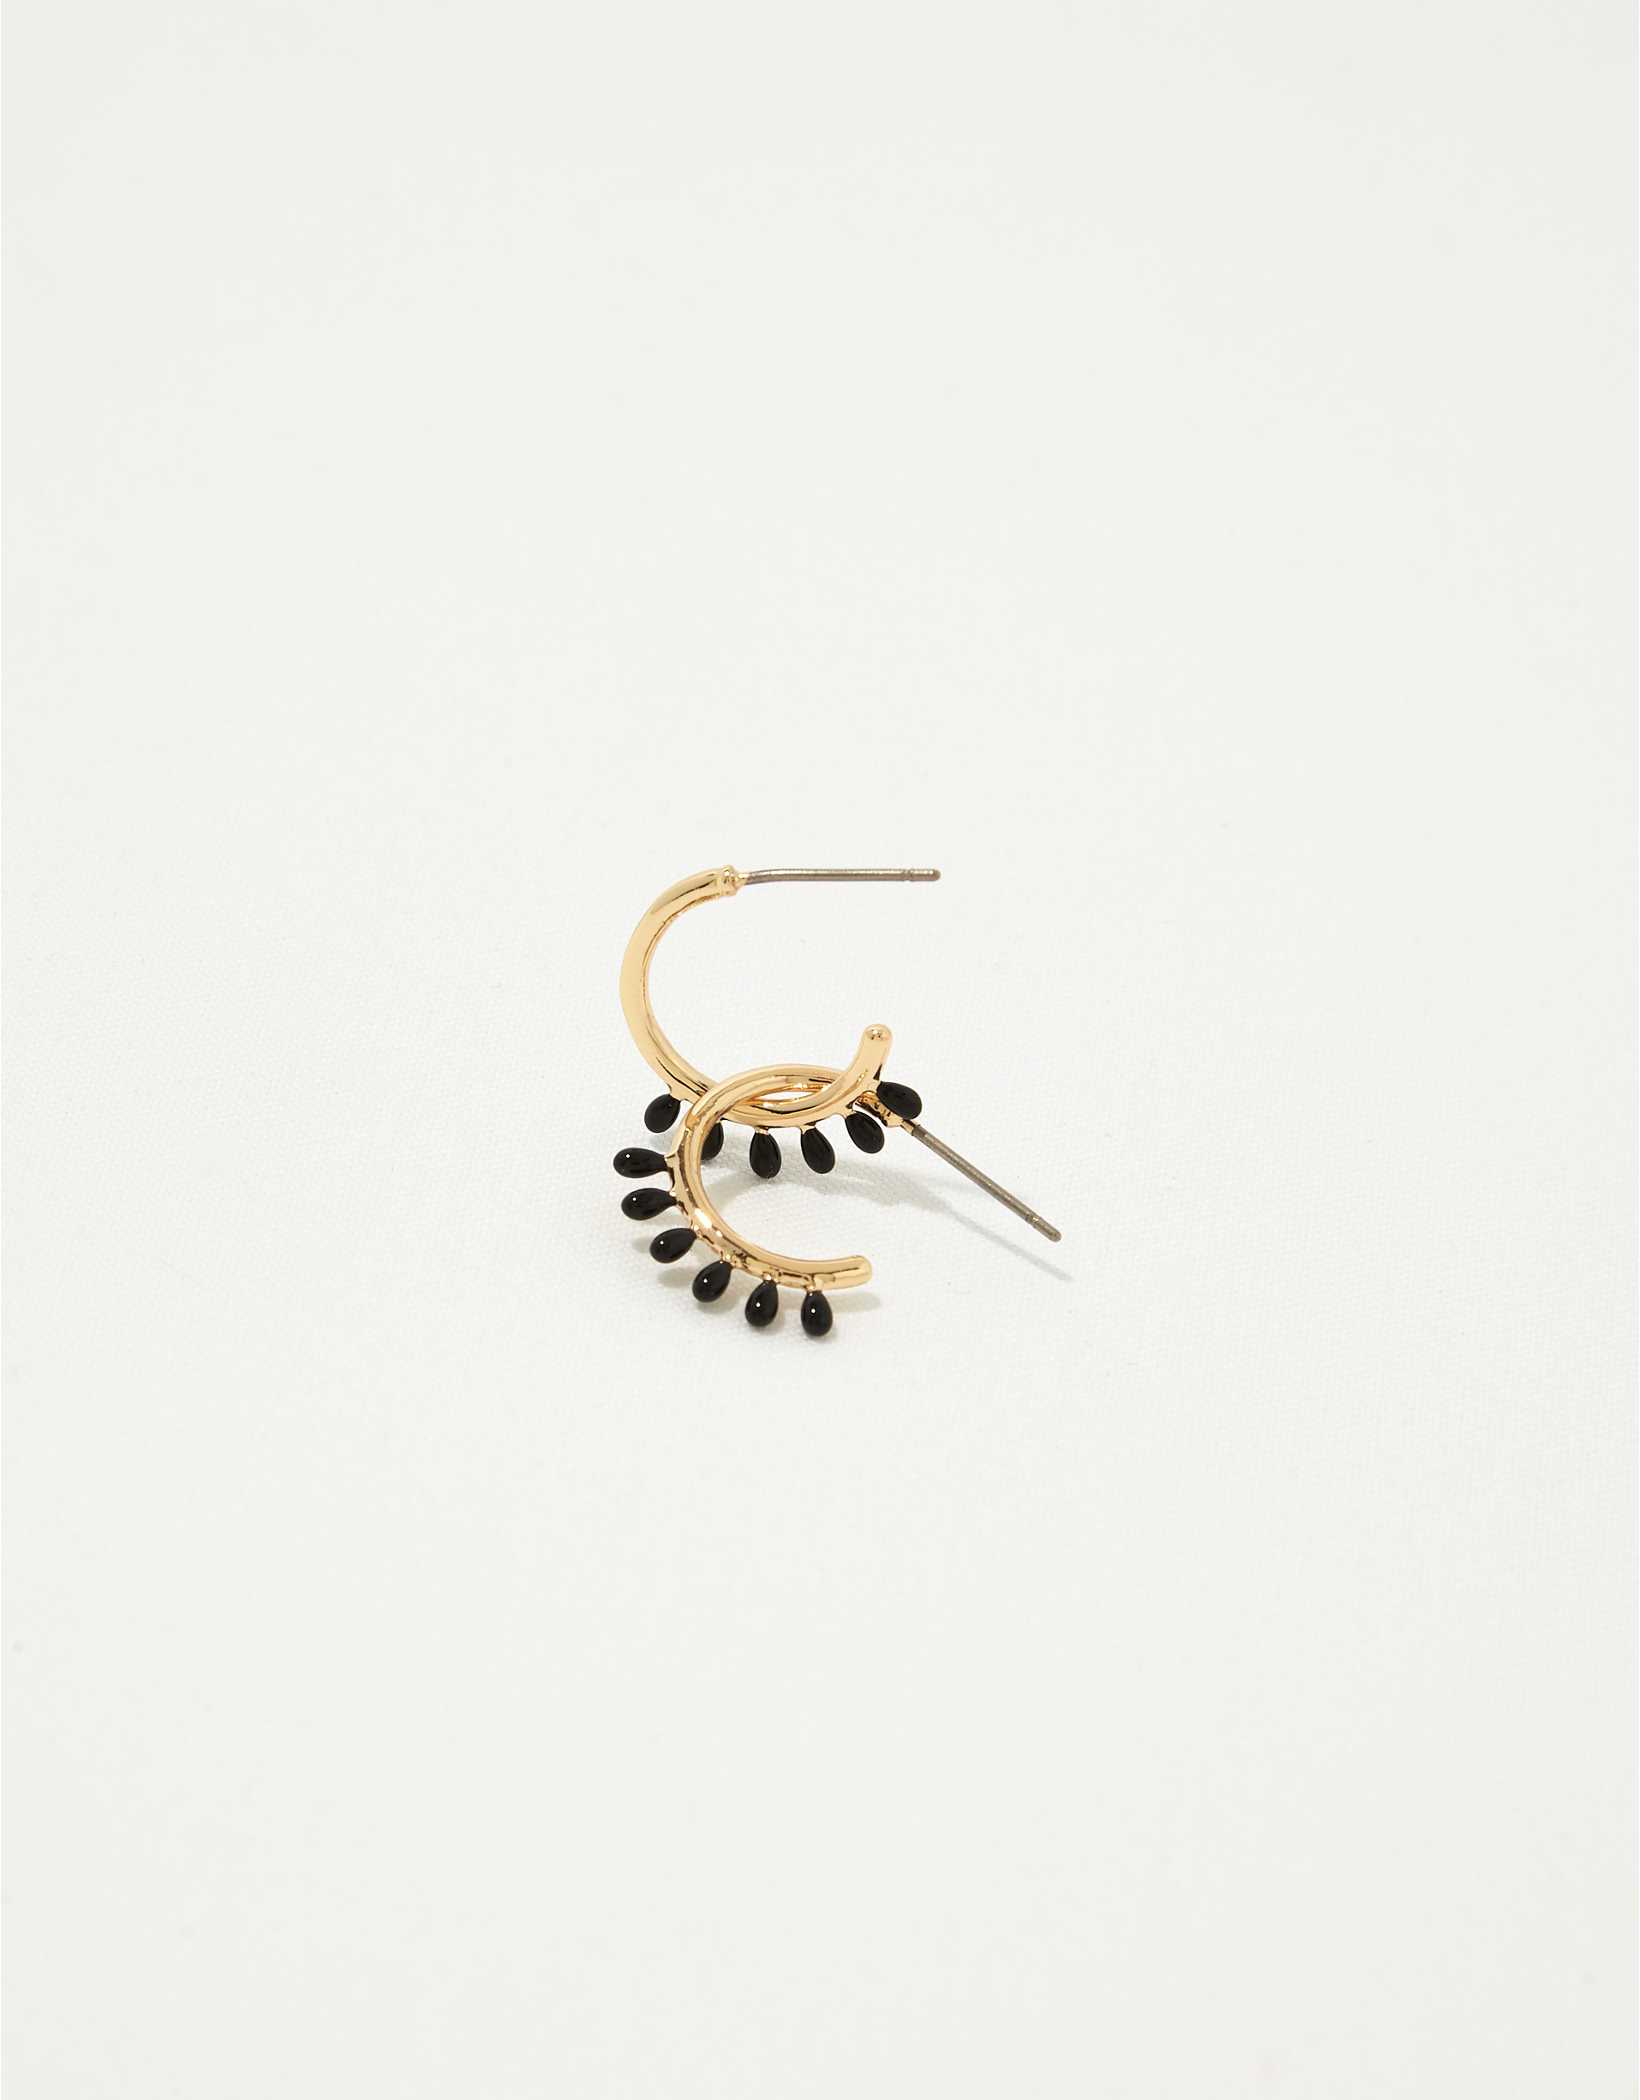 Aerie Resin Tipped Earrings